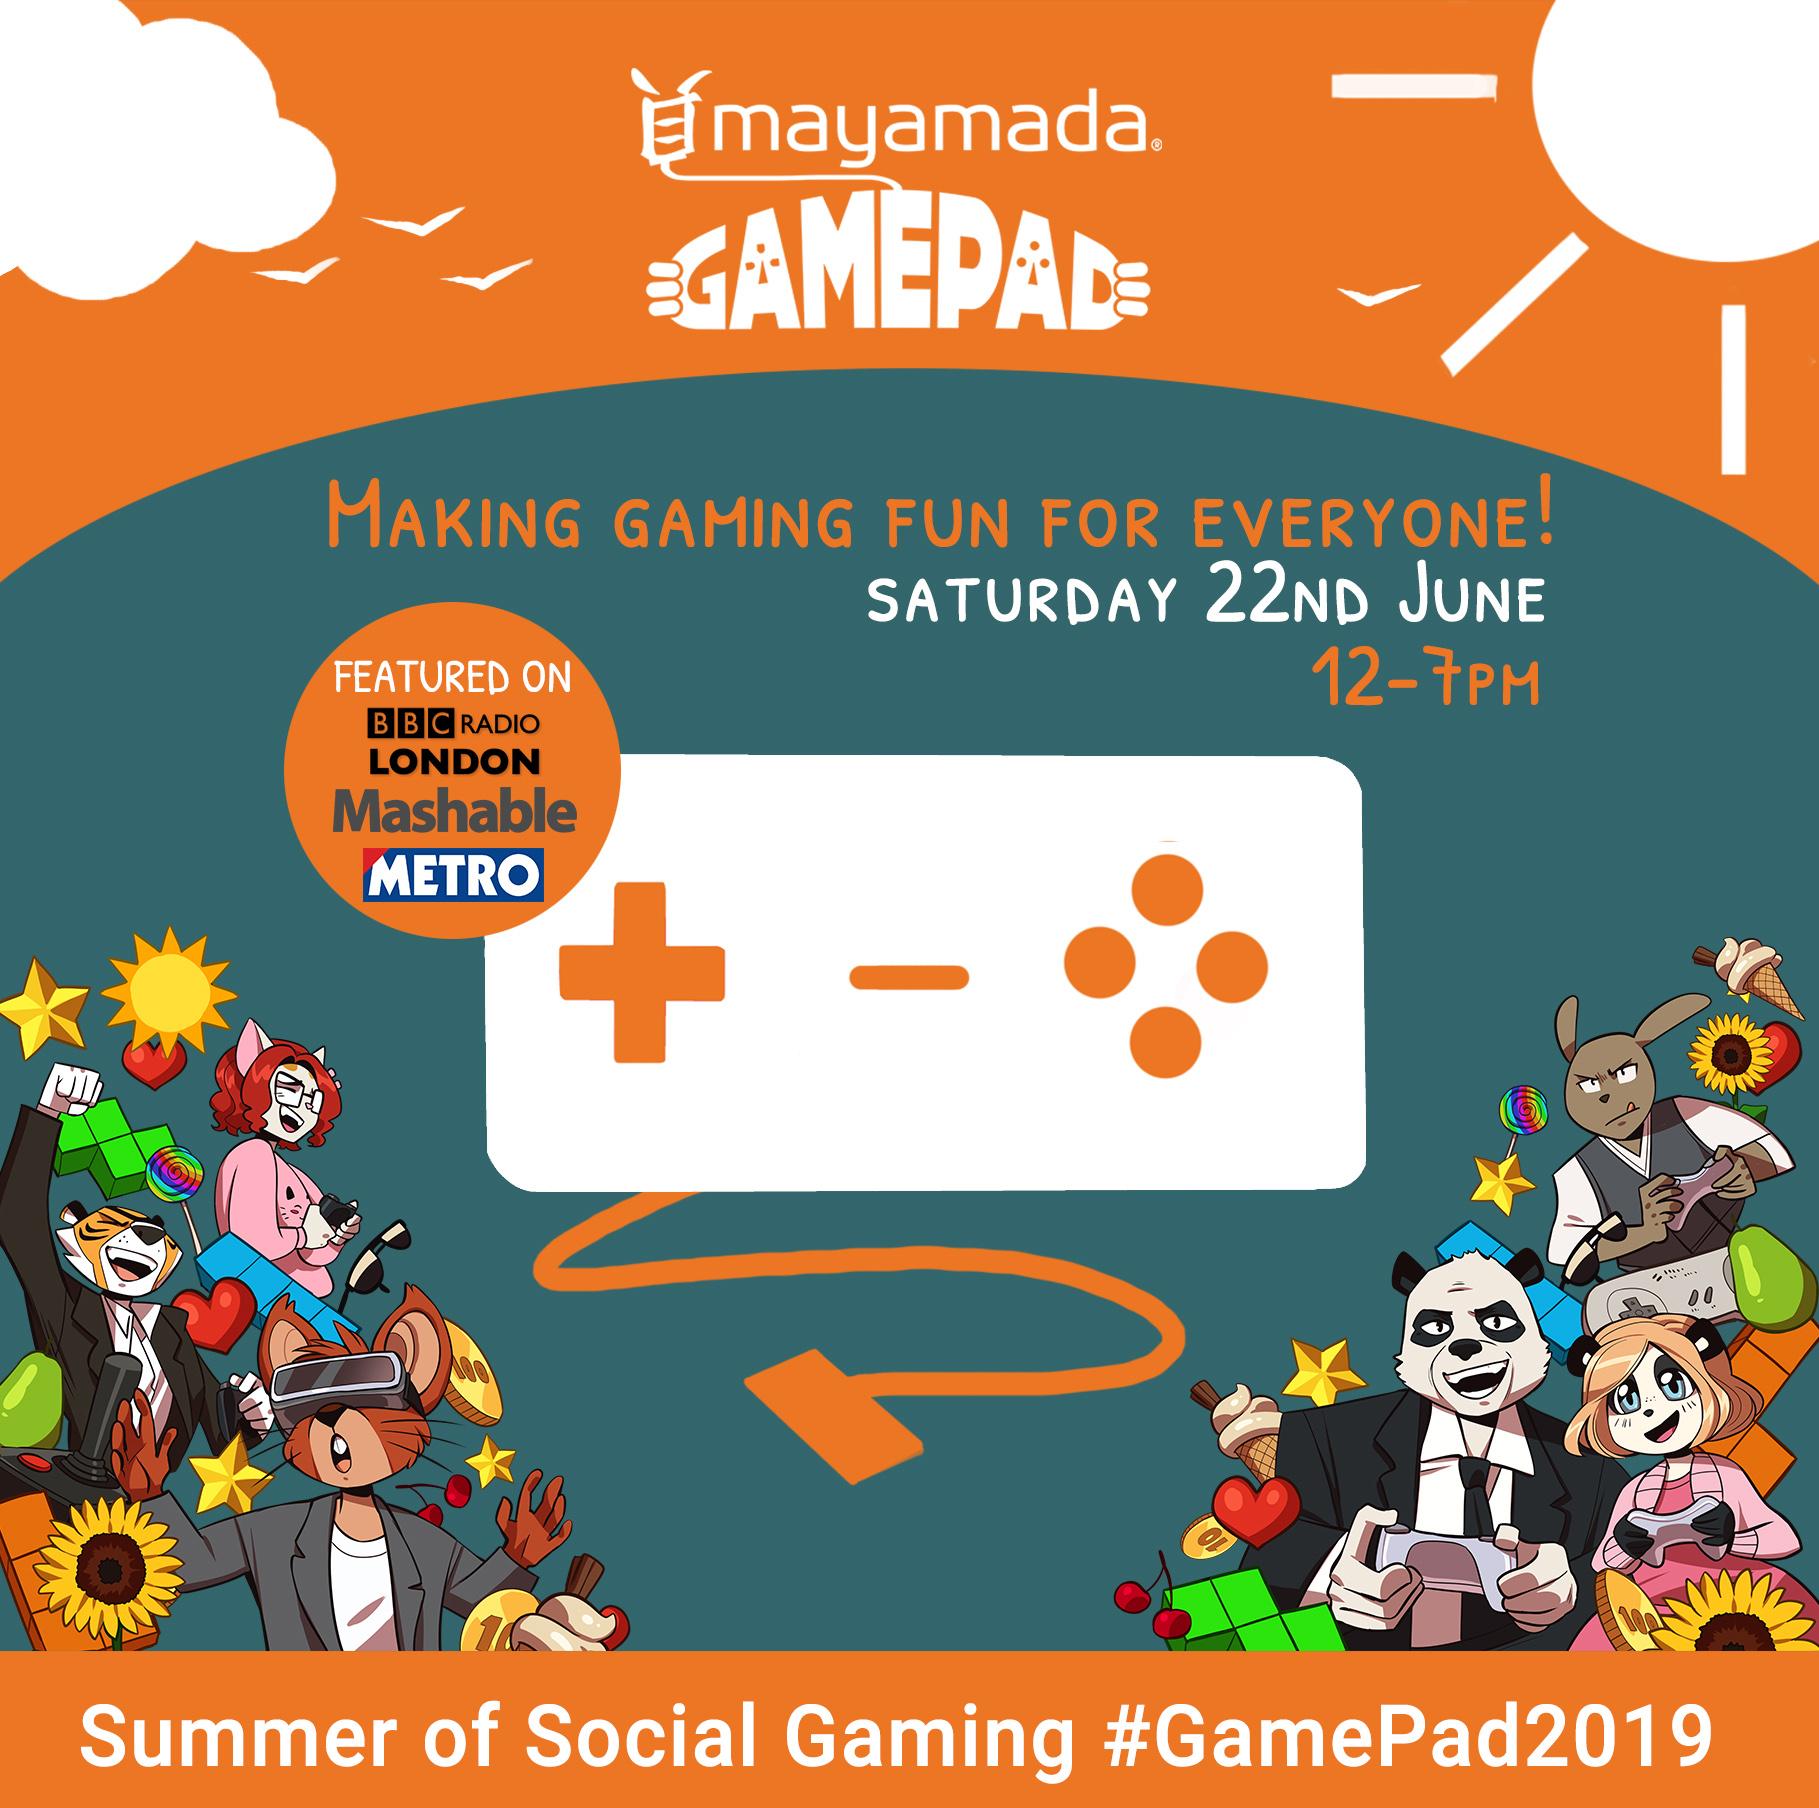 GamePad 2019@ Summer Promo